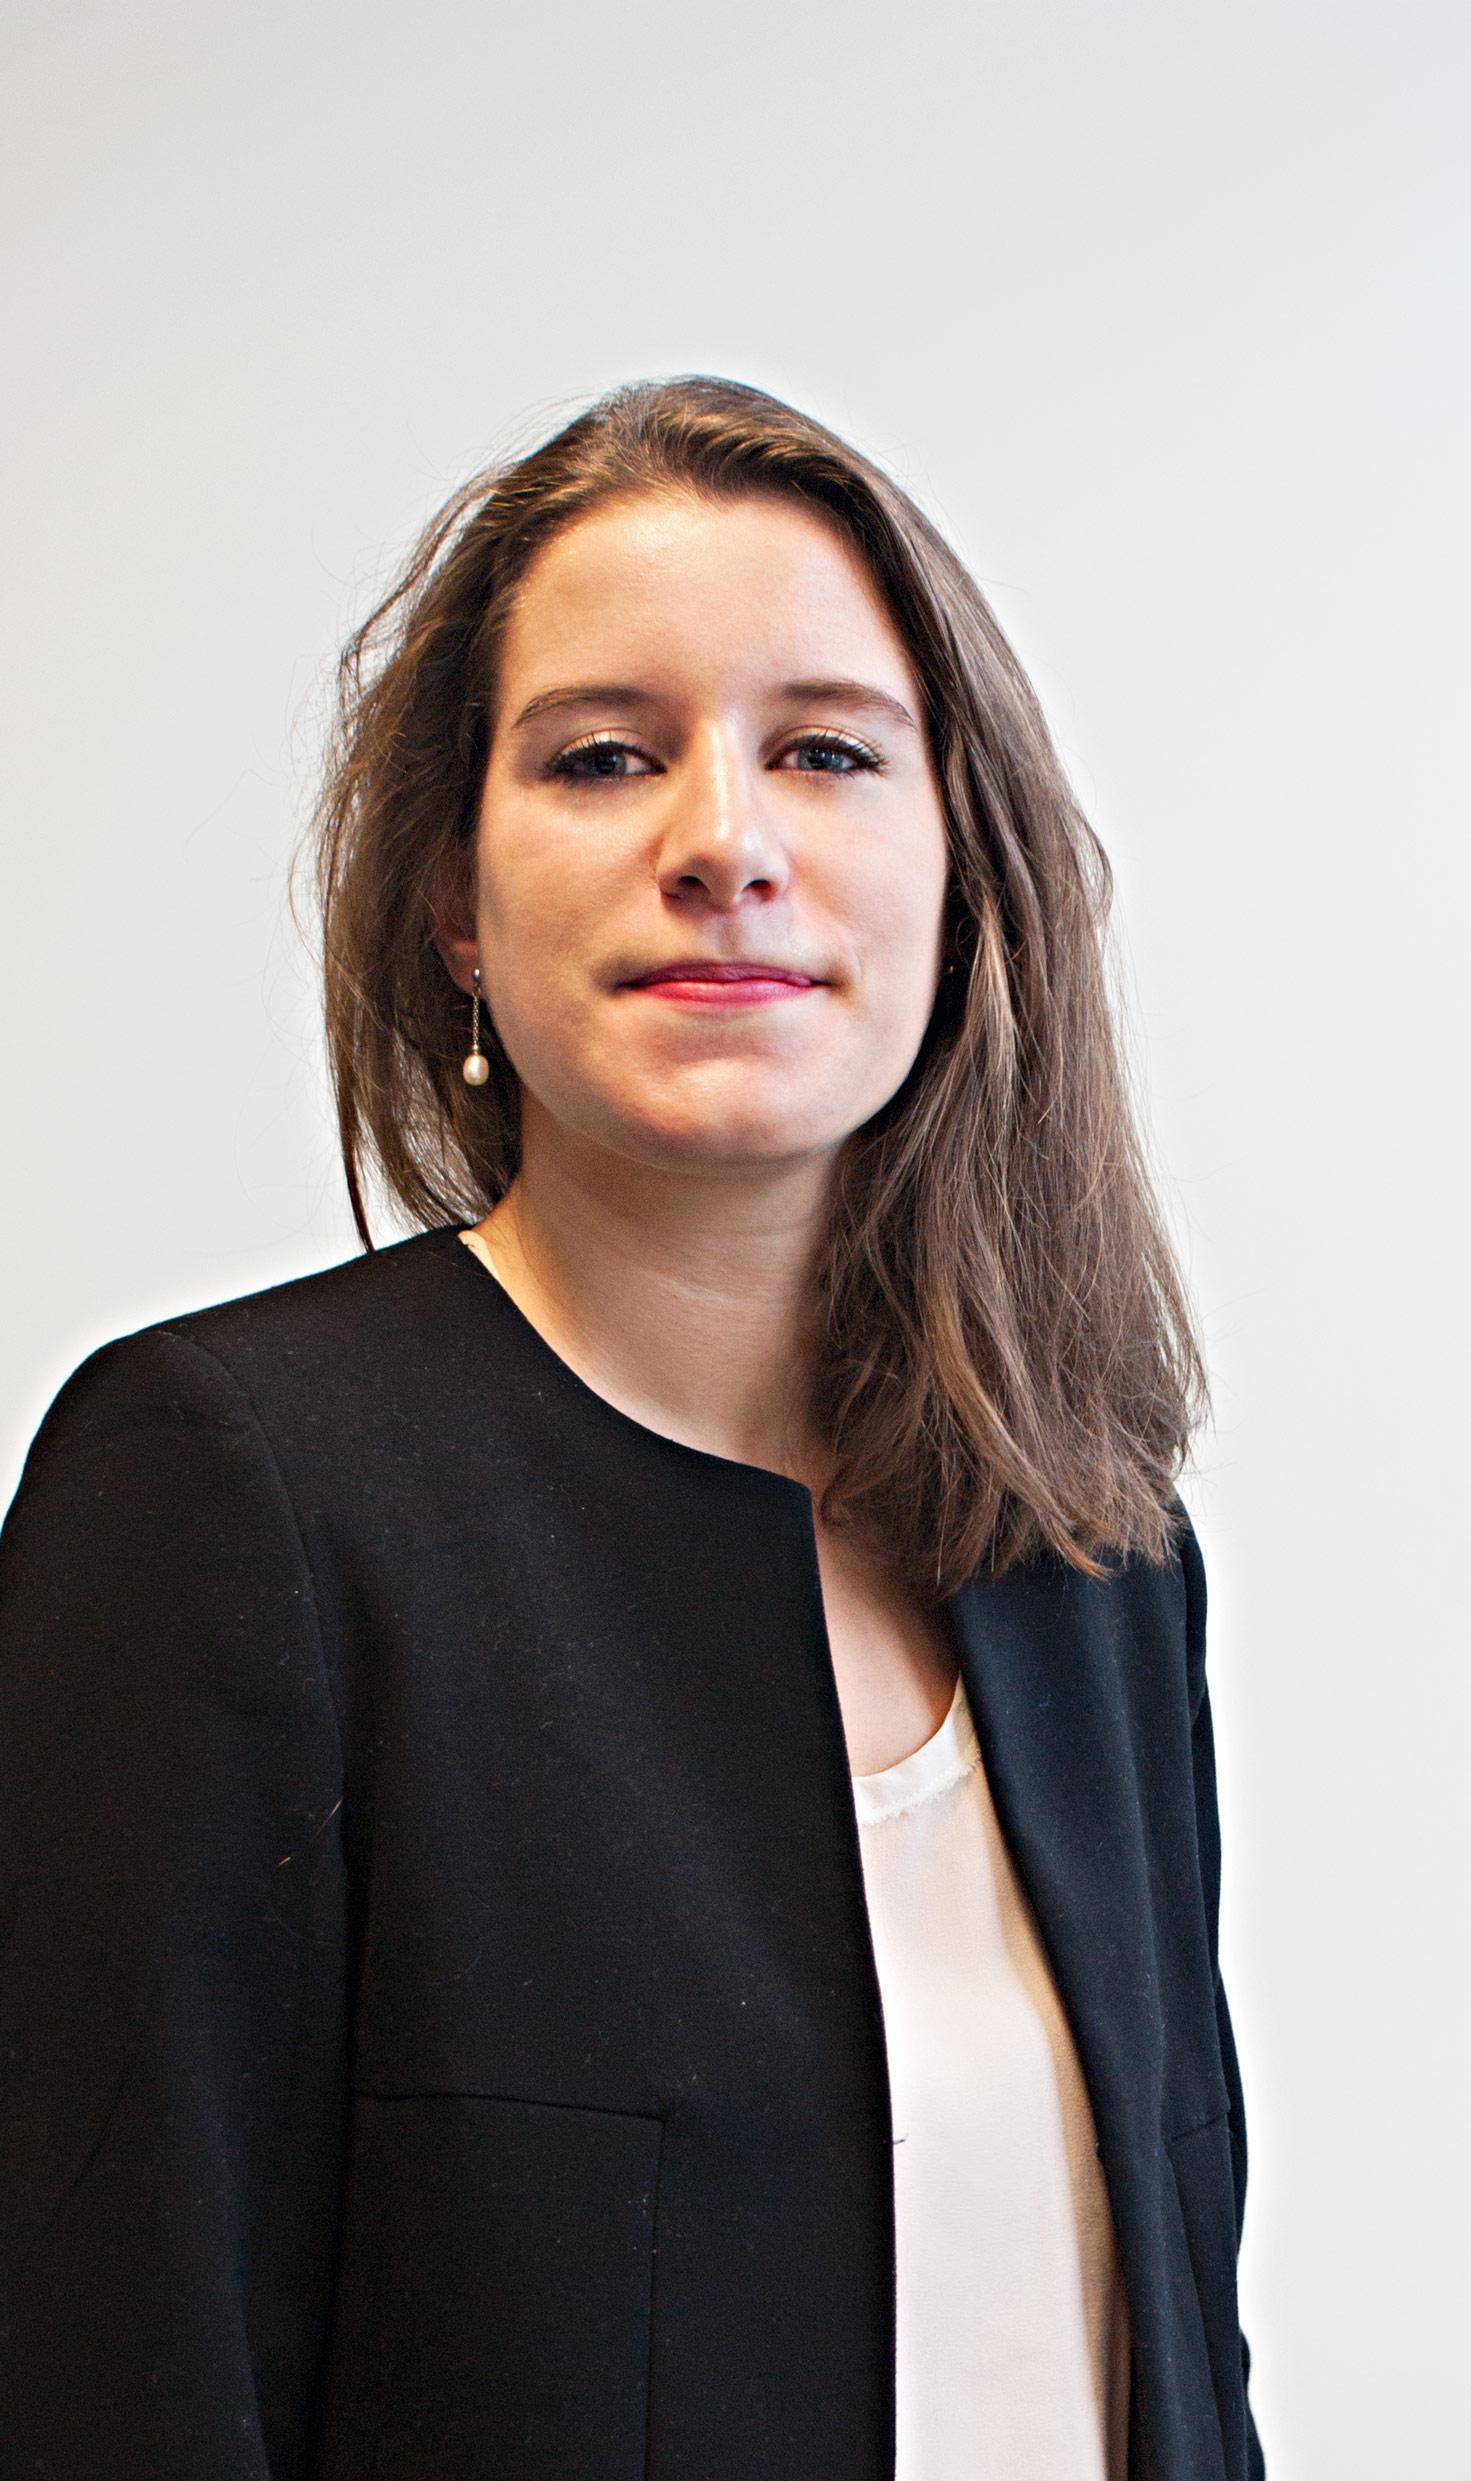 Anne-Sophie Leurent